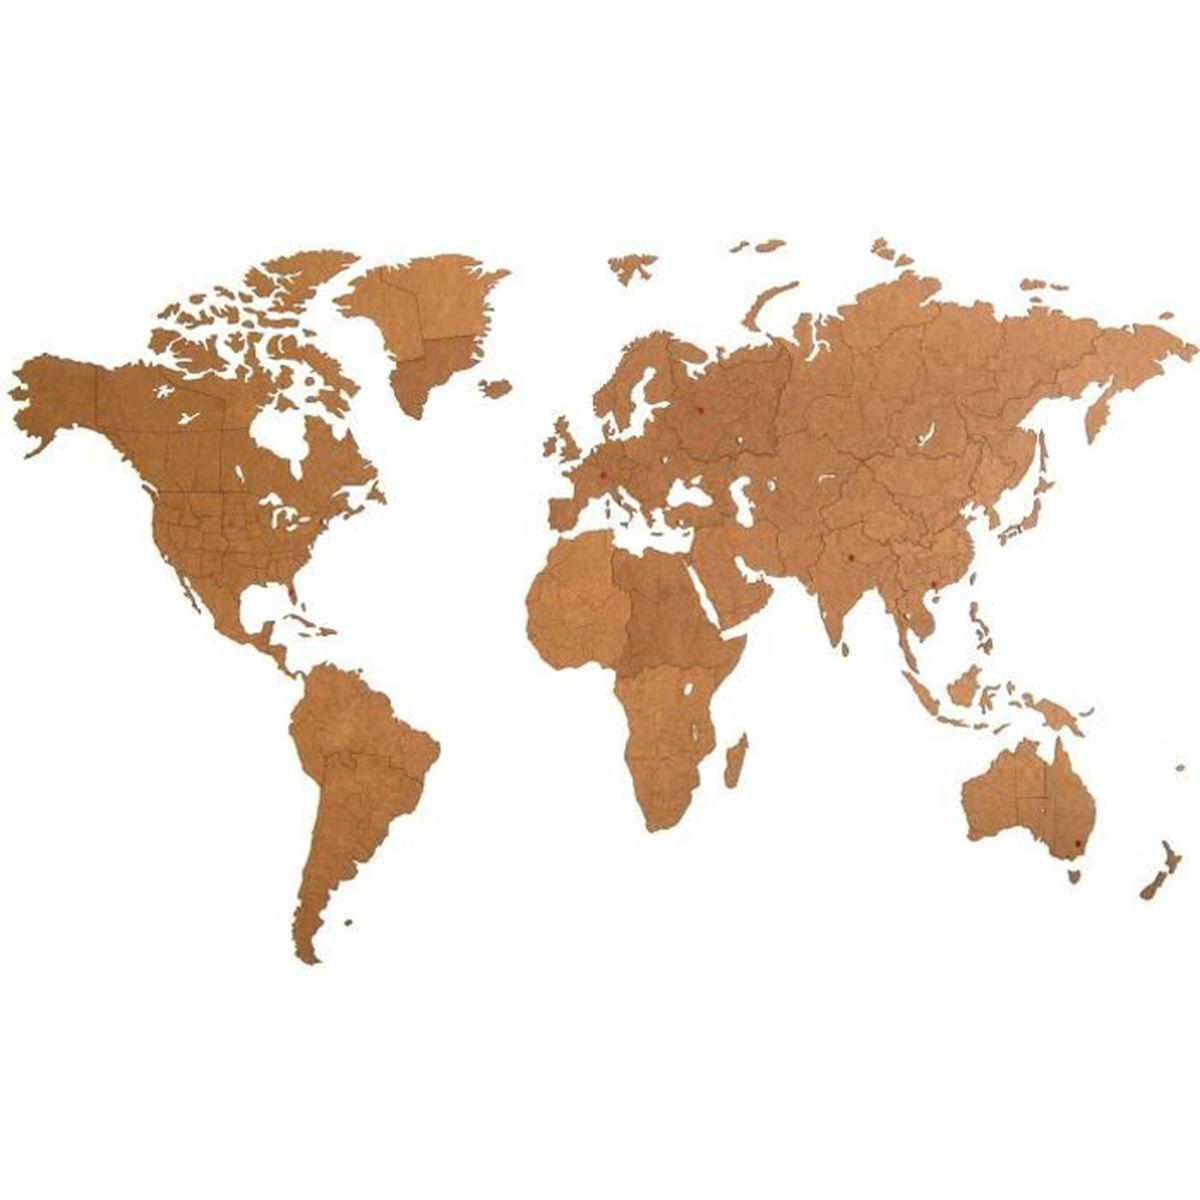 mimi innovations d coration murale g ant carte du monde en. Black Bedroom Furniture Sets. Home Design Ideas